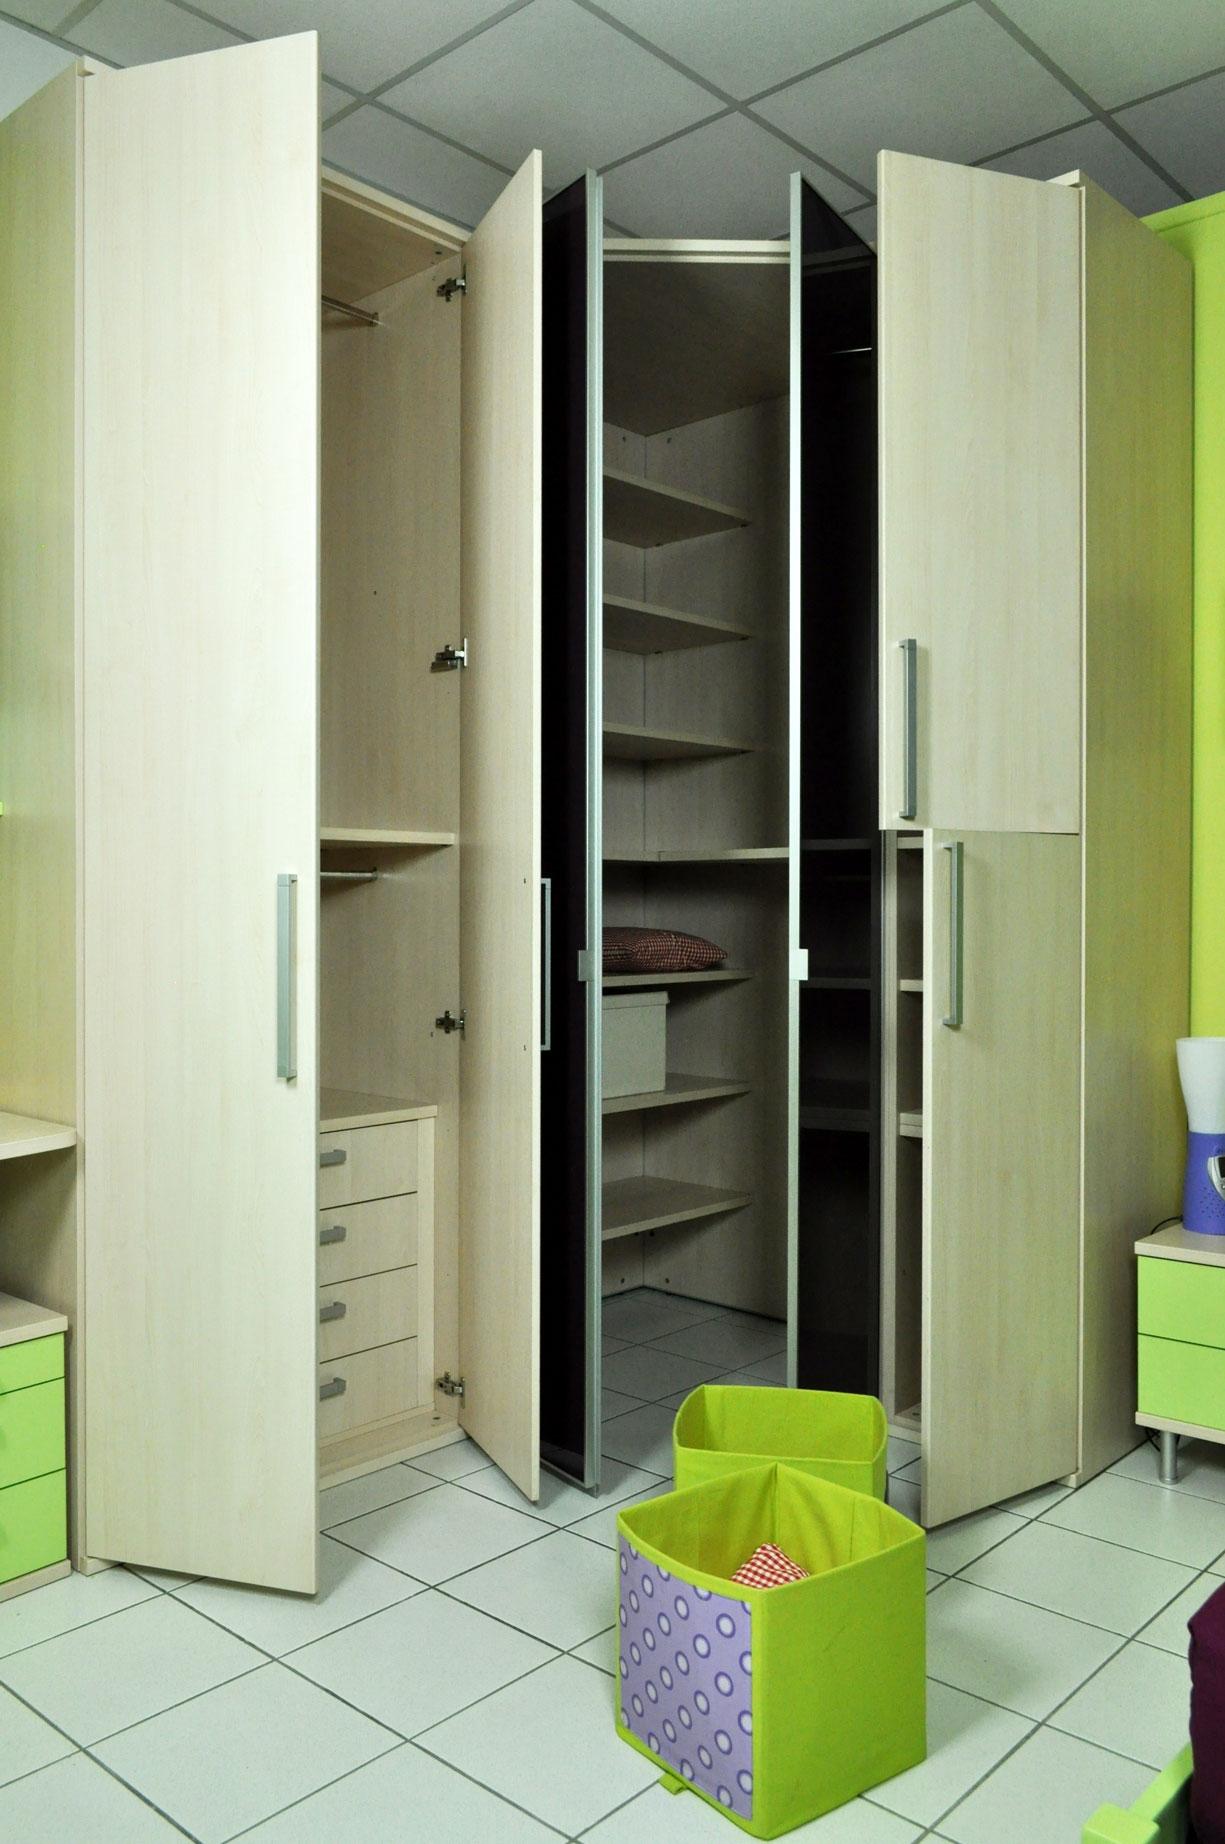 Ikea interni cabine armadio - Cabine armadio colombini ...